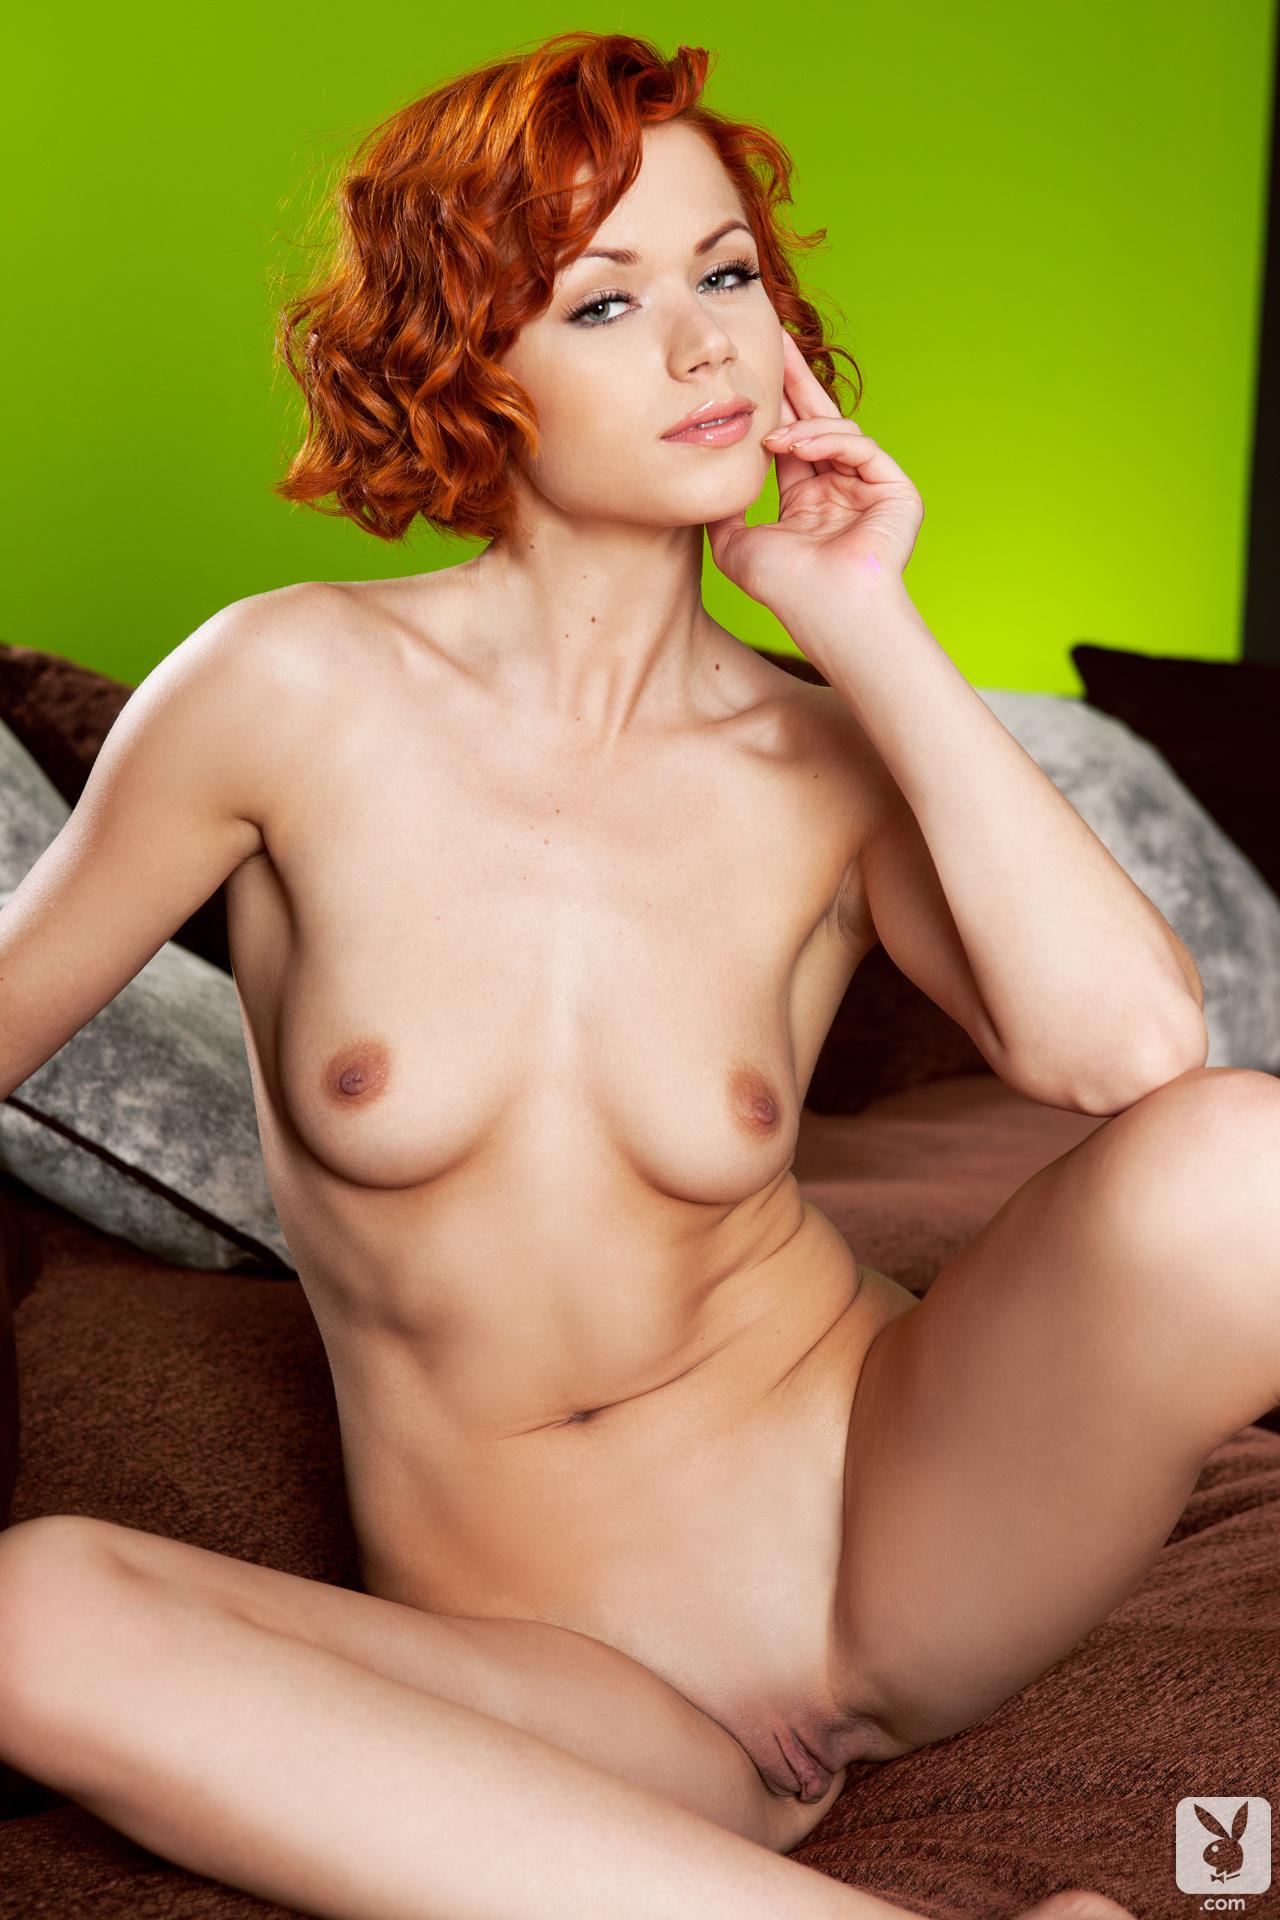 kamila-hermanova-lude-sofa-redhead-slim-body-playboy-30